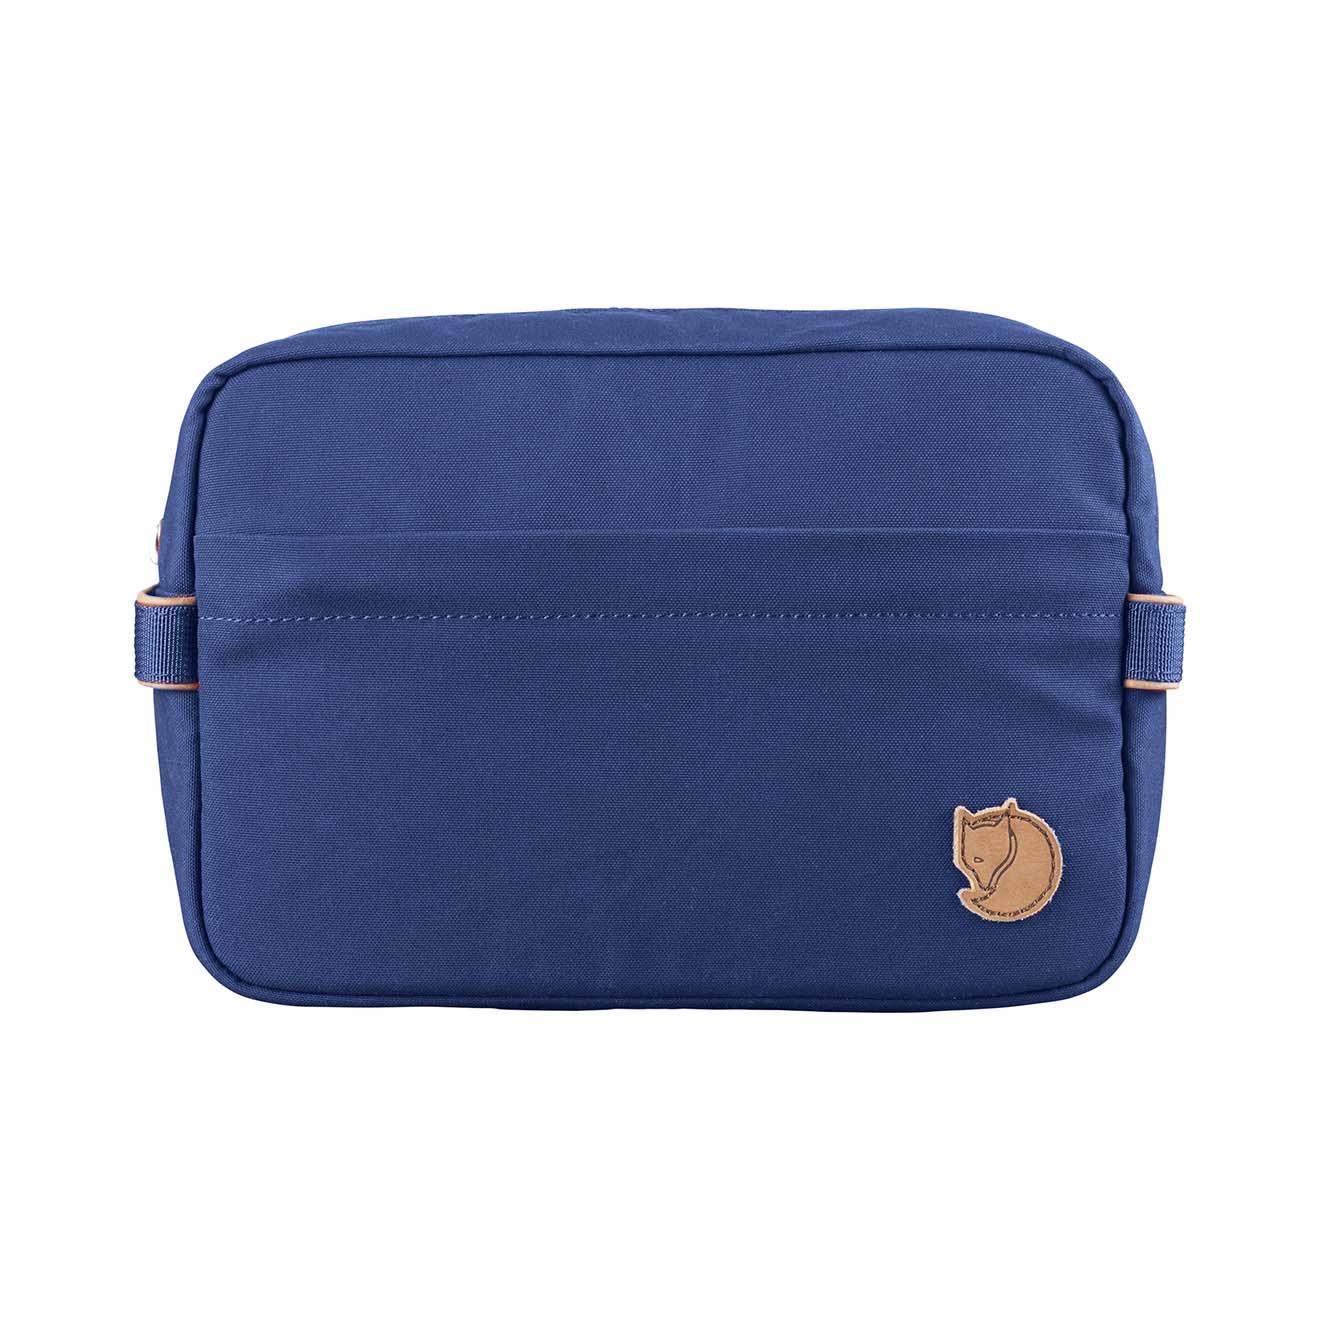 Fjallraven Travel Toiletry Bag Deep Blue - The Sporting Lodge 9b4f59dedd152